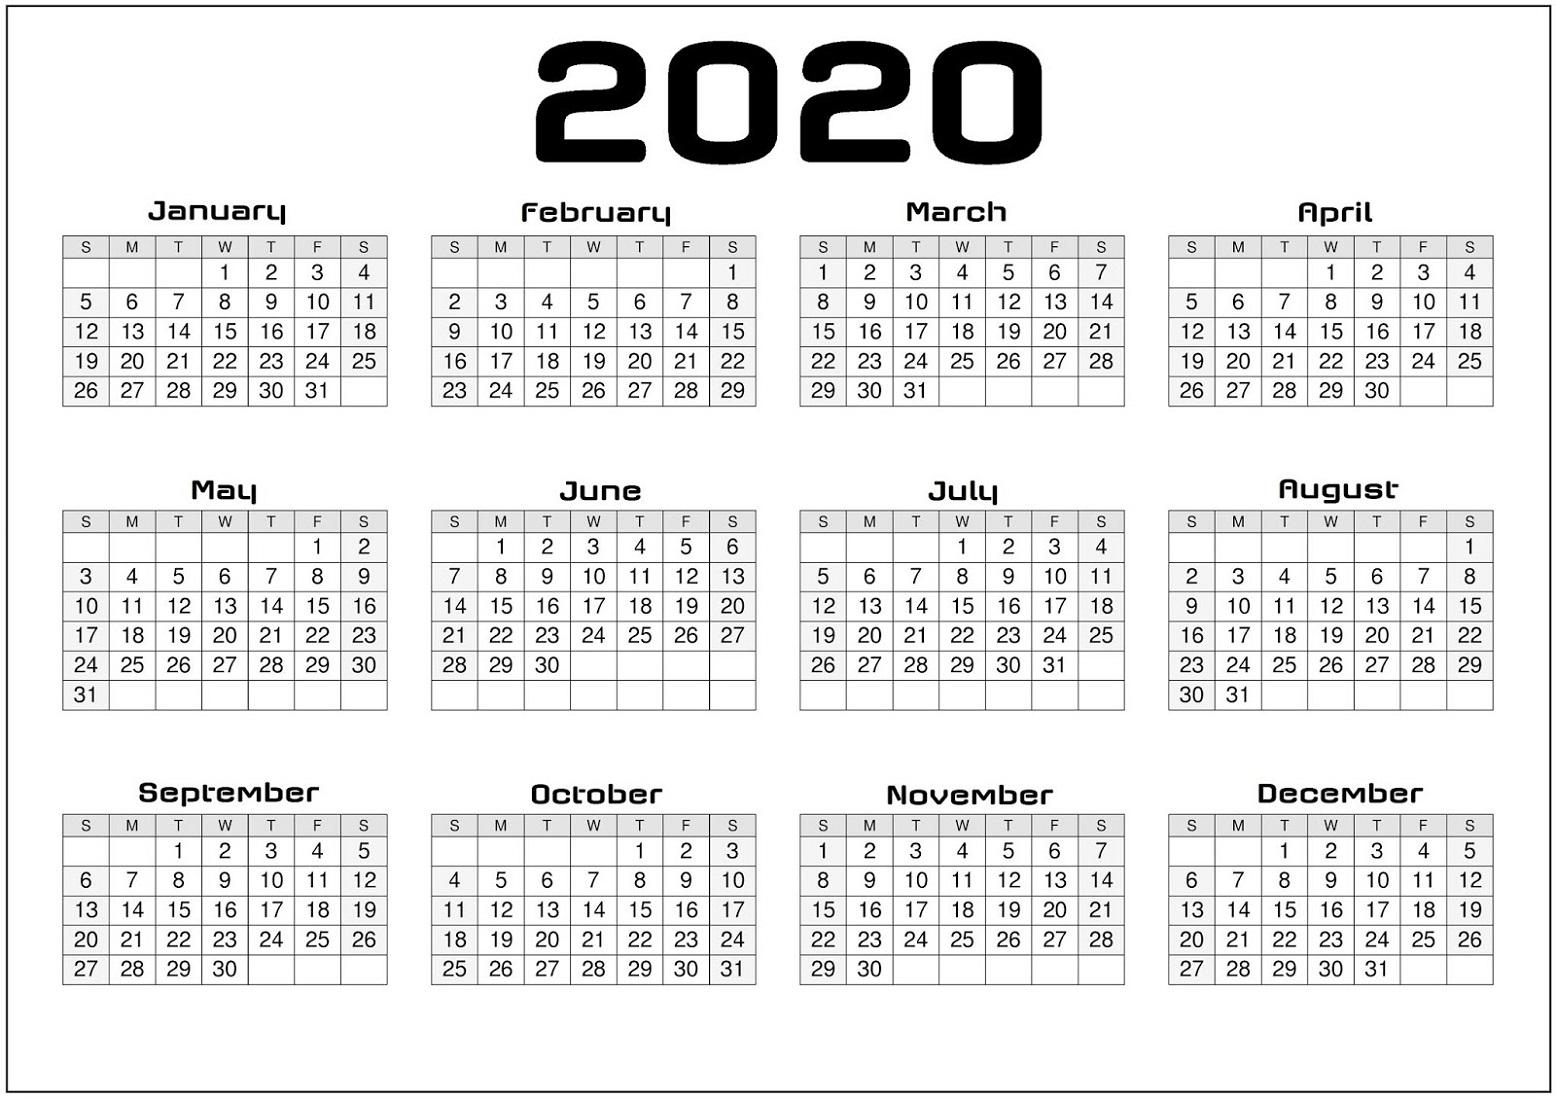 2020 Calendar Labs Template | Example Calendar Printable intended for Printable Blank Calendar Template